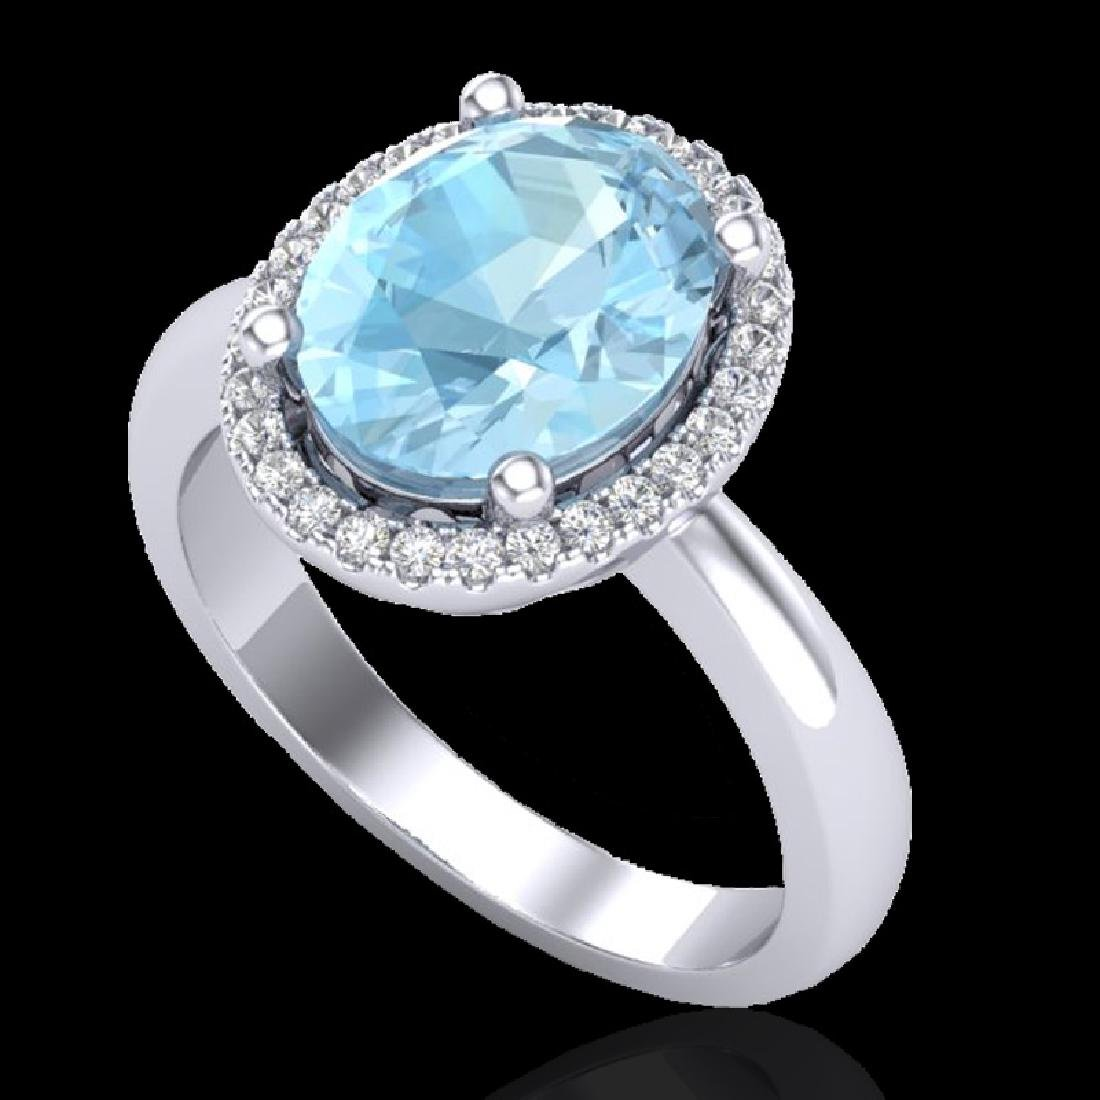 2.50 CTW Aquamarine & Micro Pave VS/SI Diamond Ring